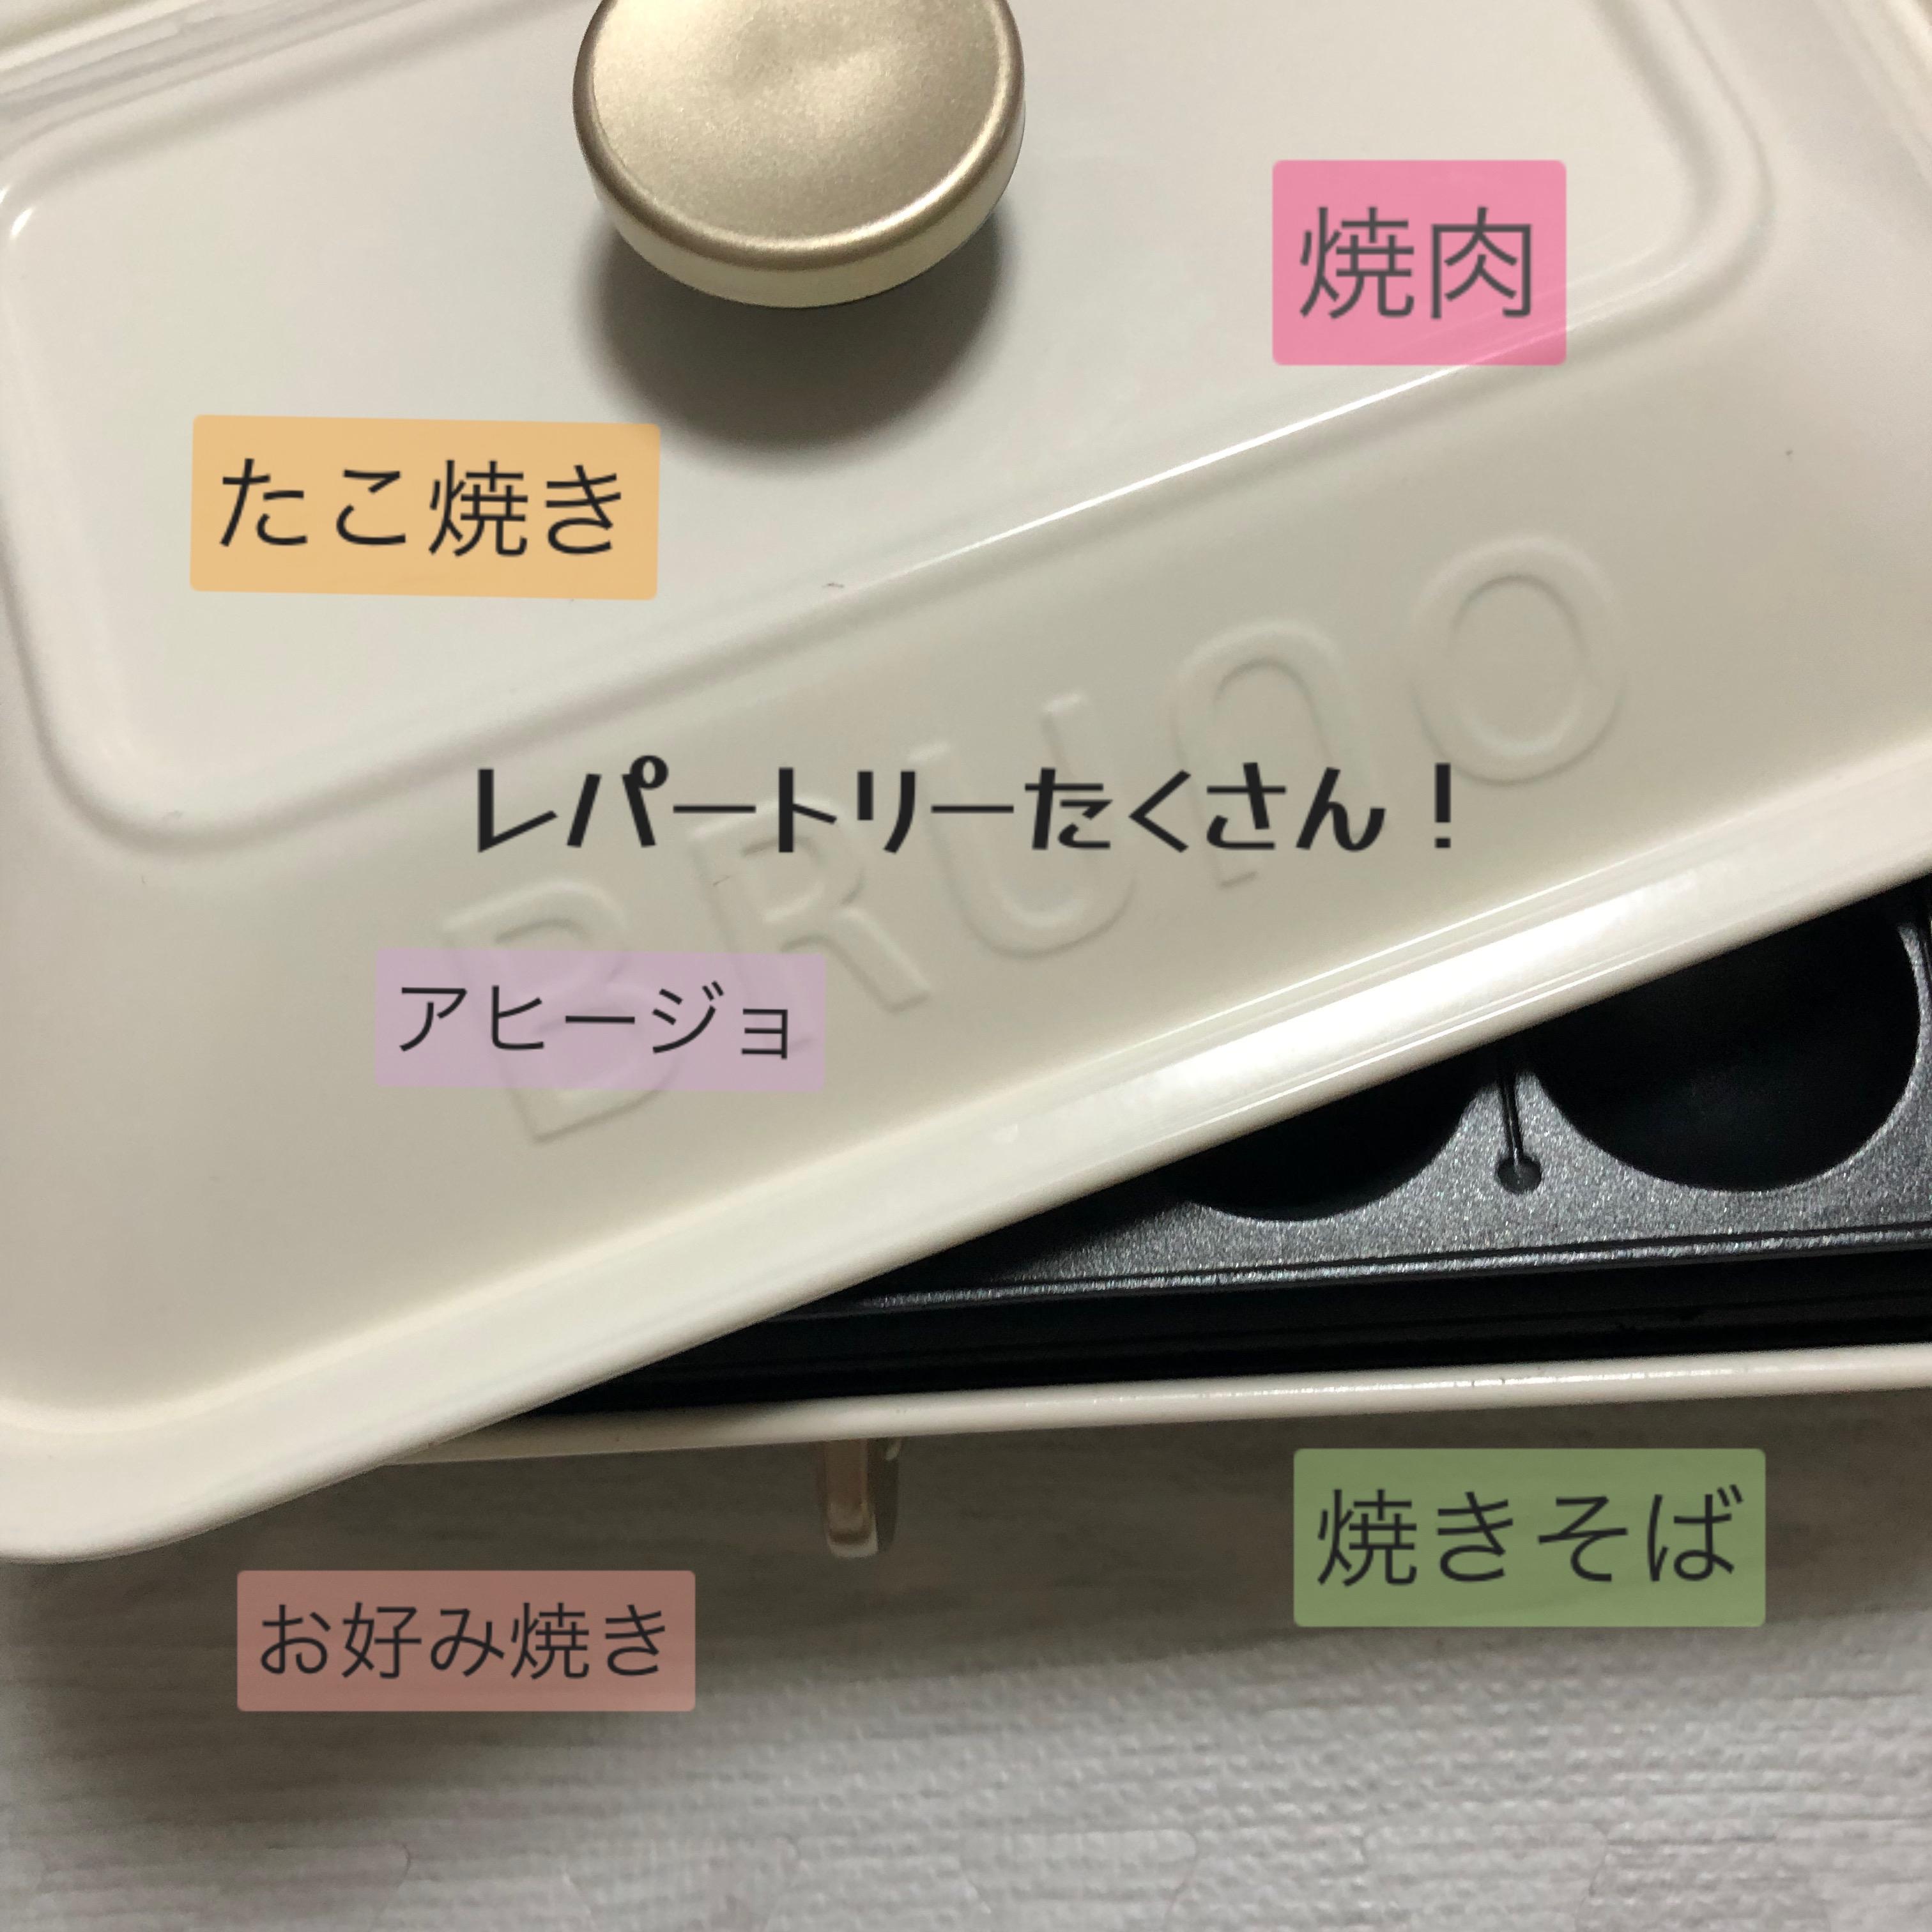 BRUNO(ブルーノ)コンパクトホットプレート BOE021を使ったmaki kajiyamaさんのクチコミ画像2